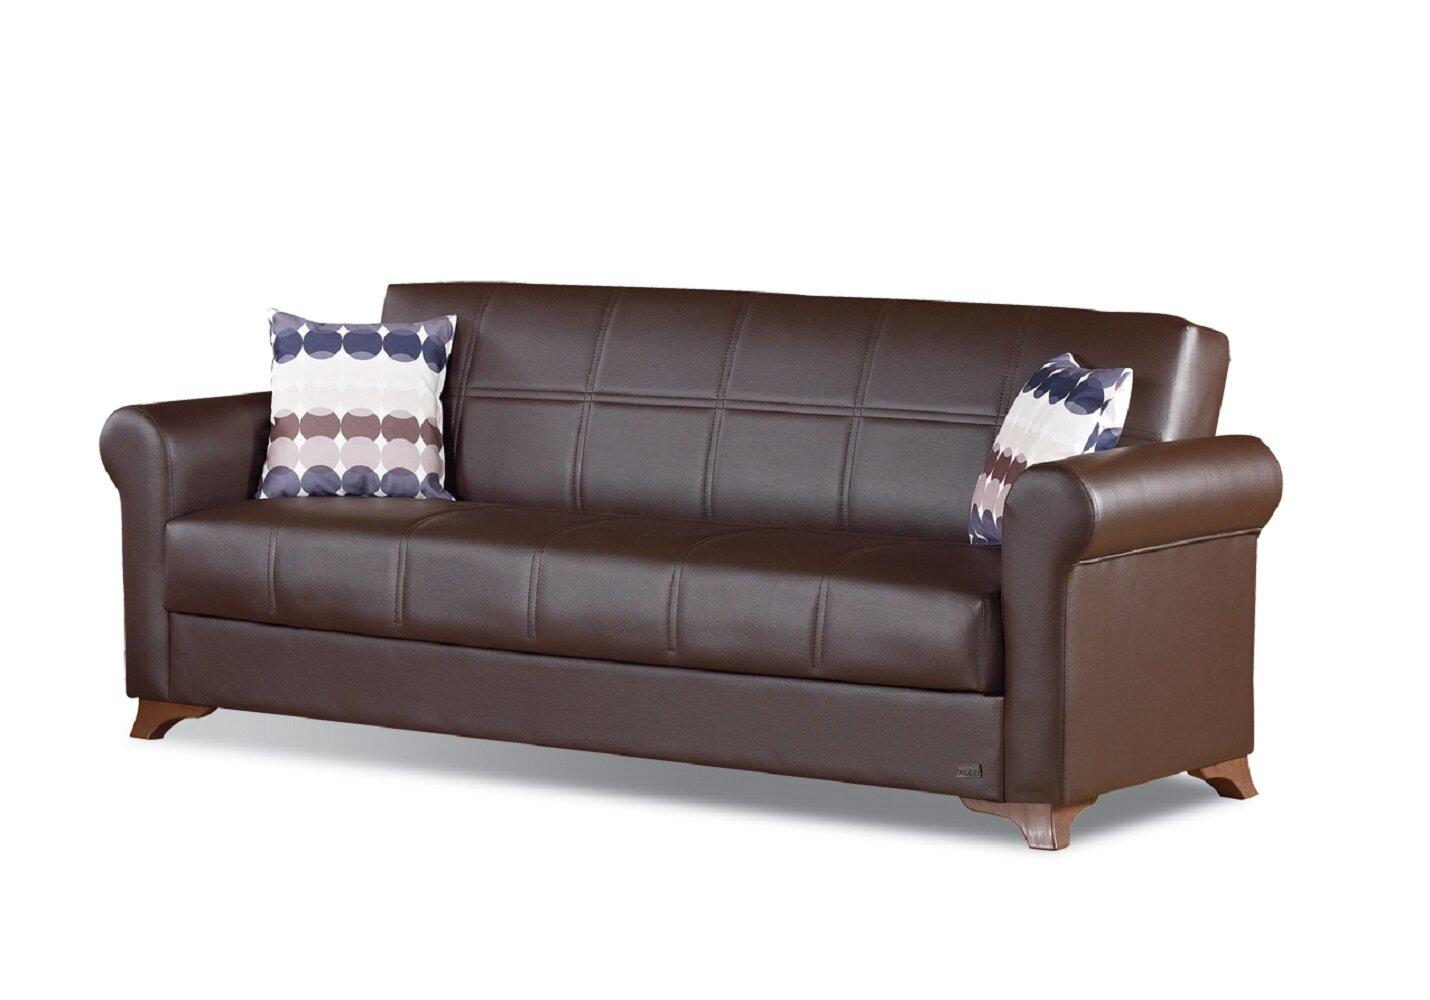 Beyan Convertible Sleeper Sofa & Reviews   Wayfair